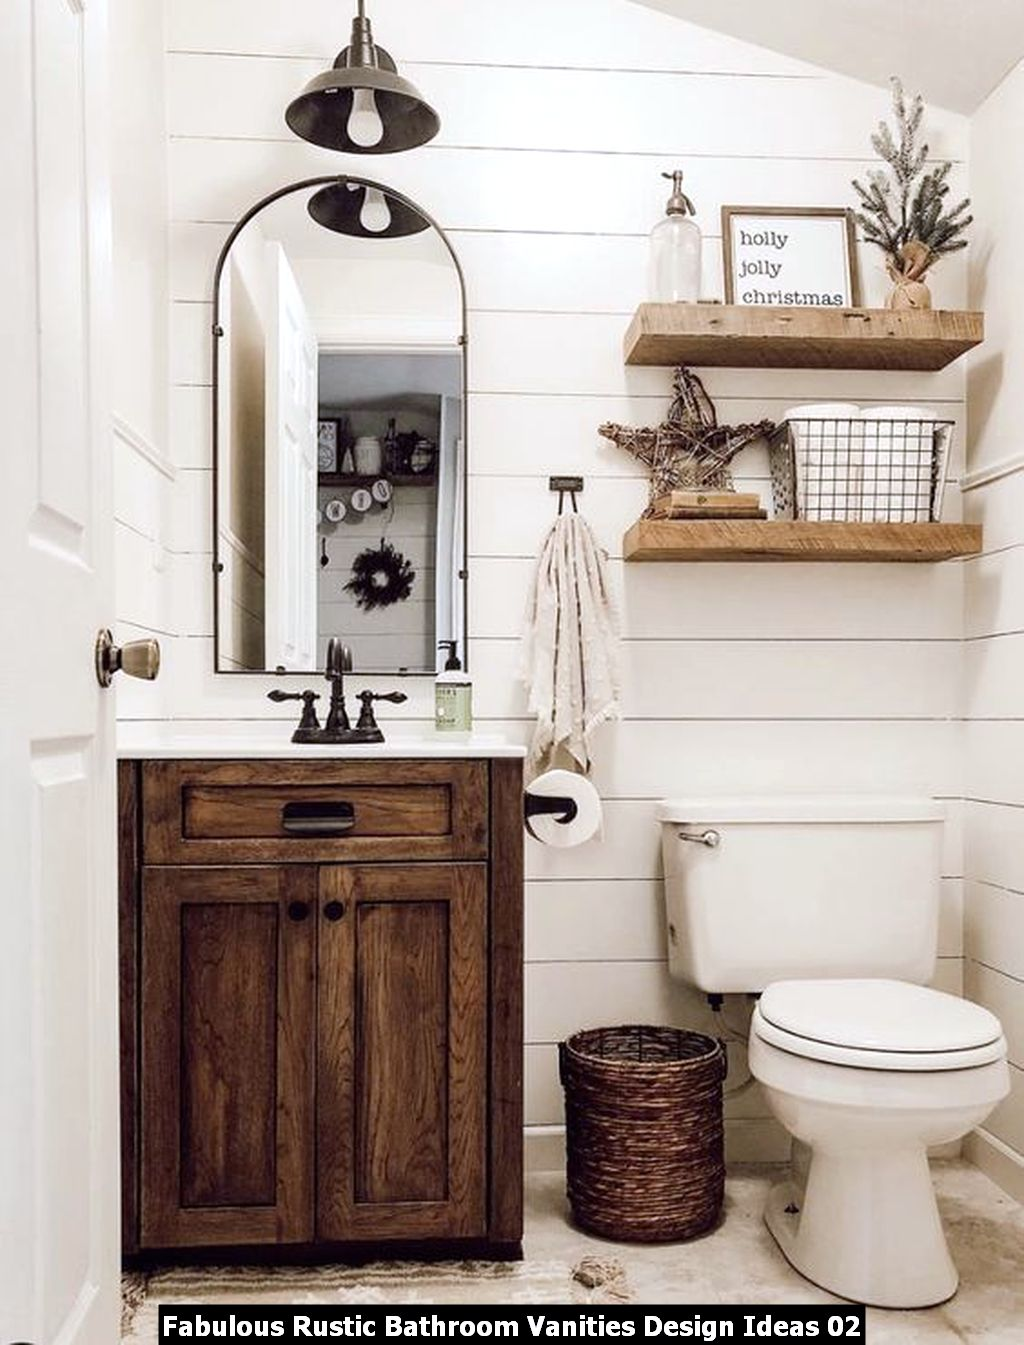 Fabulous Rustic Bathroom Vanities Design Ideas 02